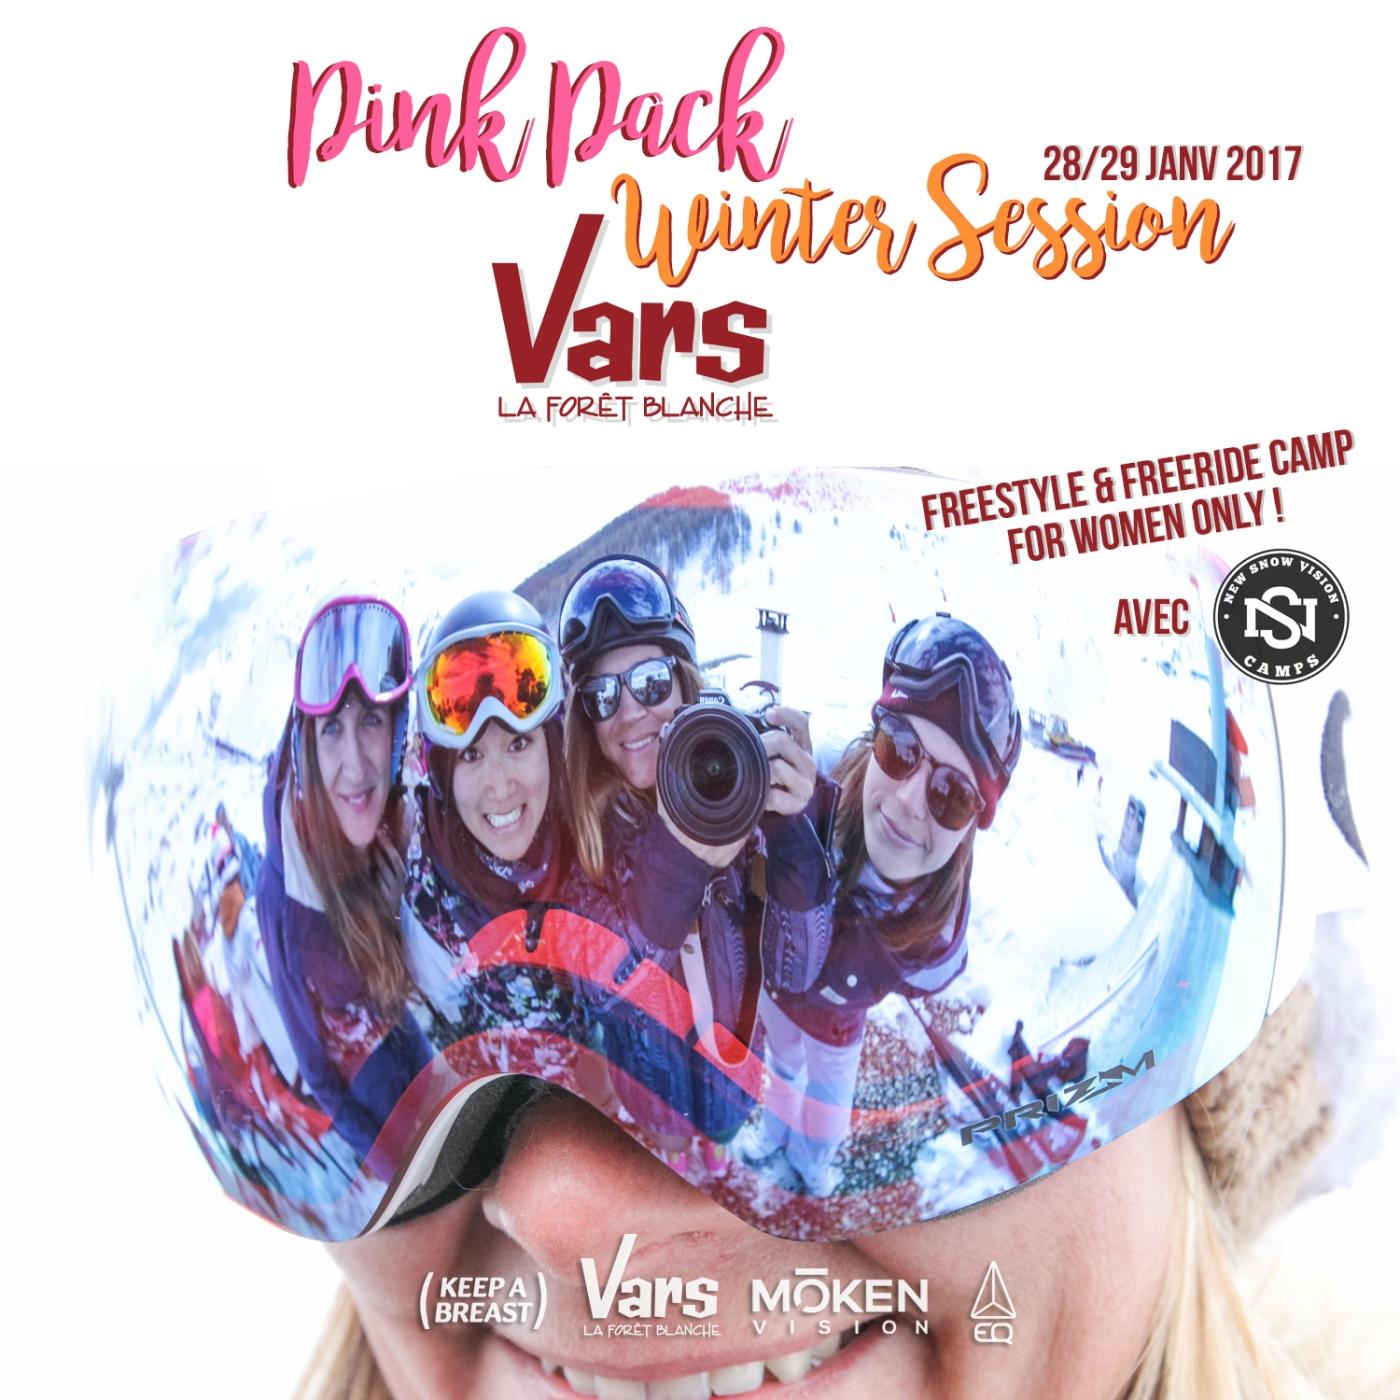 pinkpack_event_vars2017